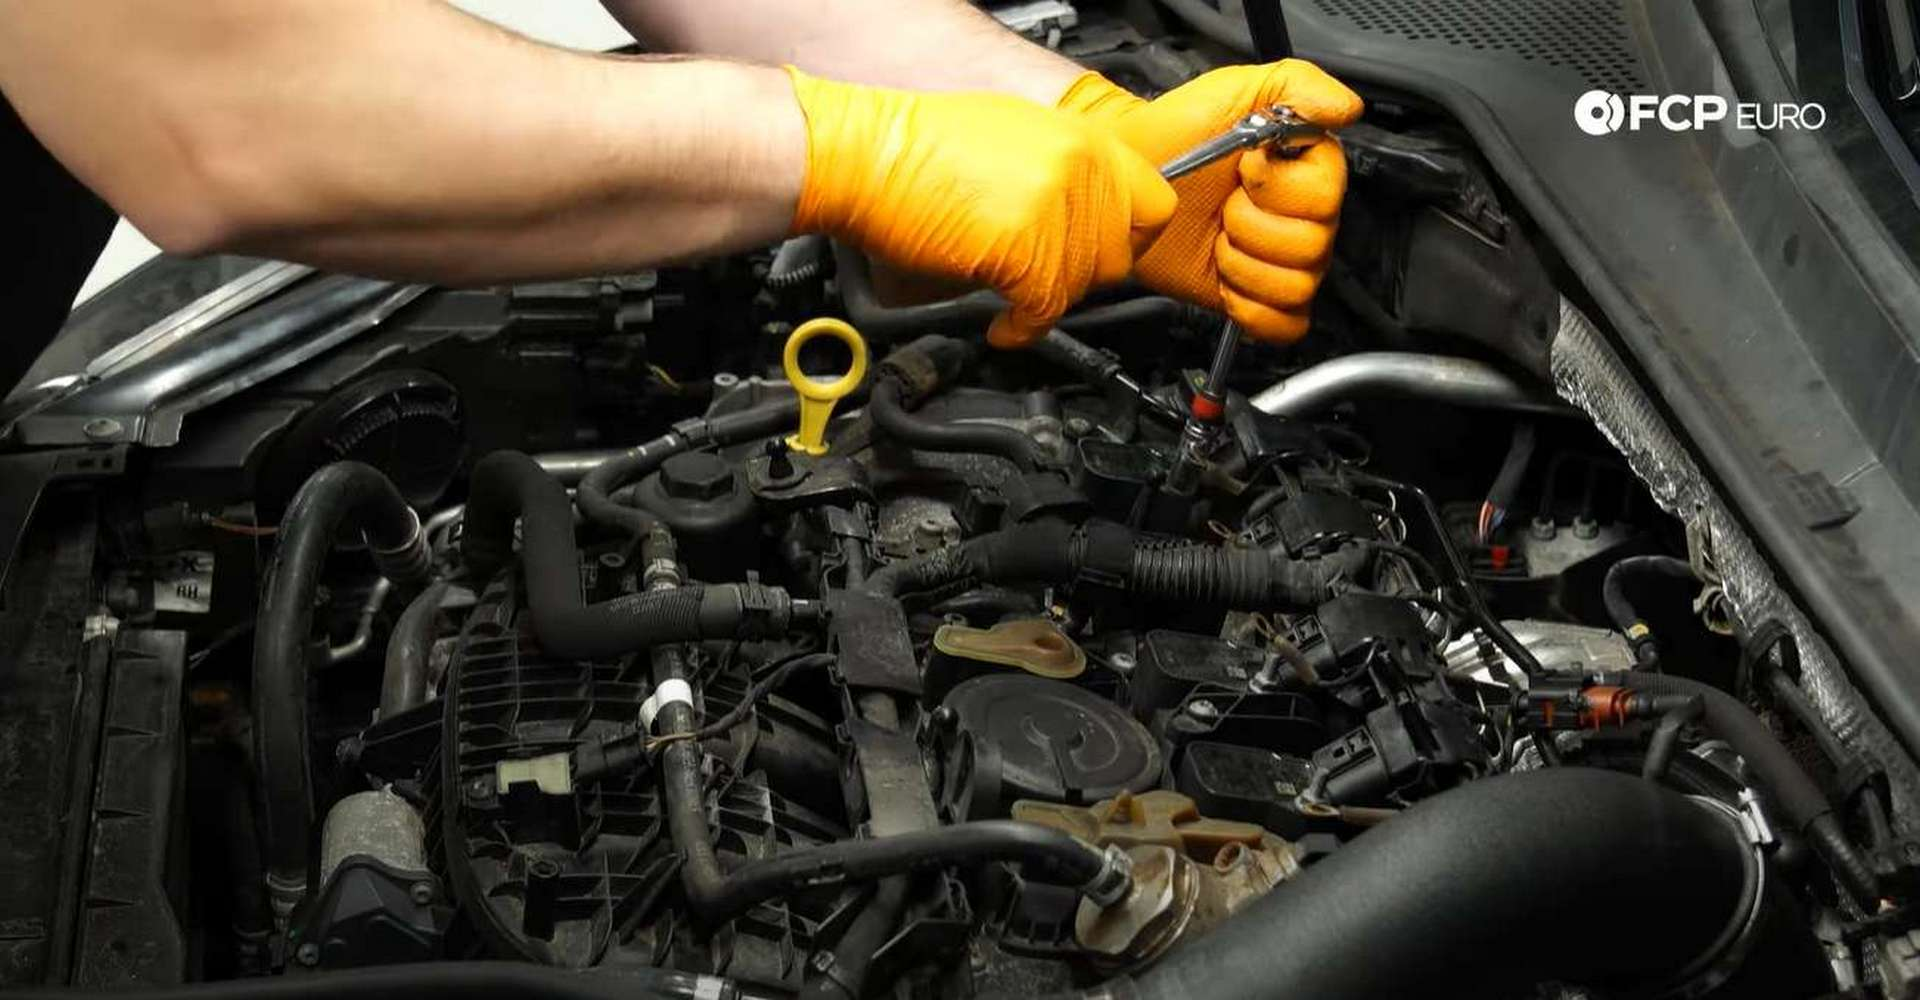 52-DIY-VW-GTI-Turbo-Upgrade_Installing-Plugs